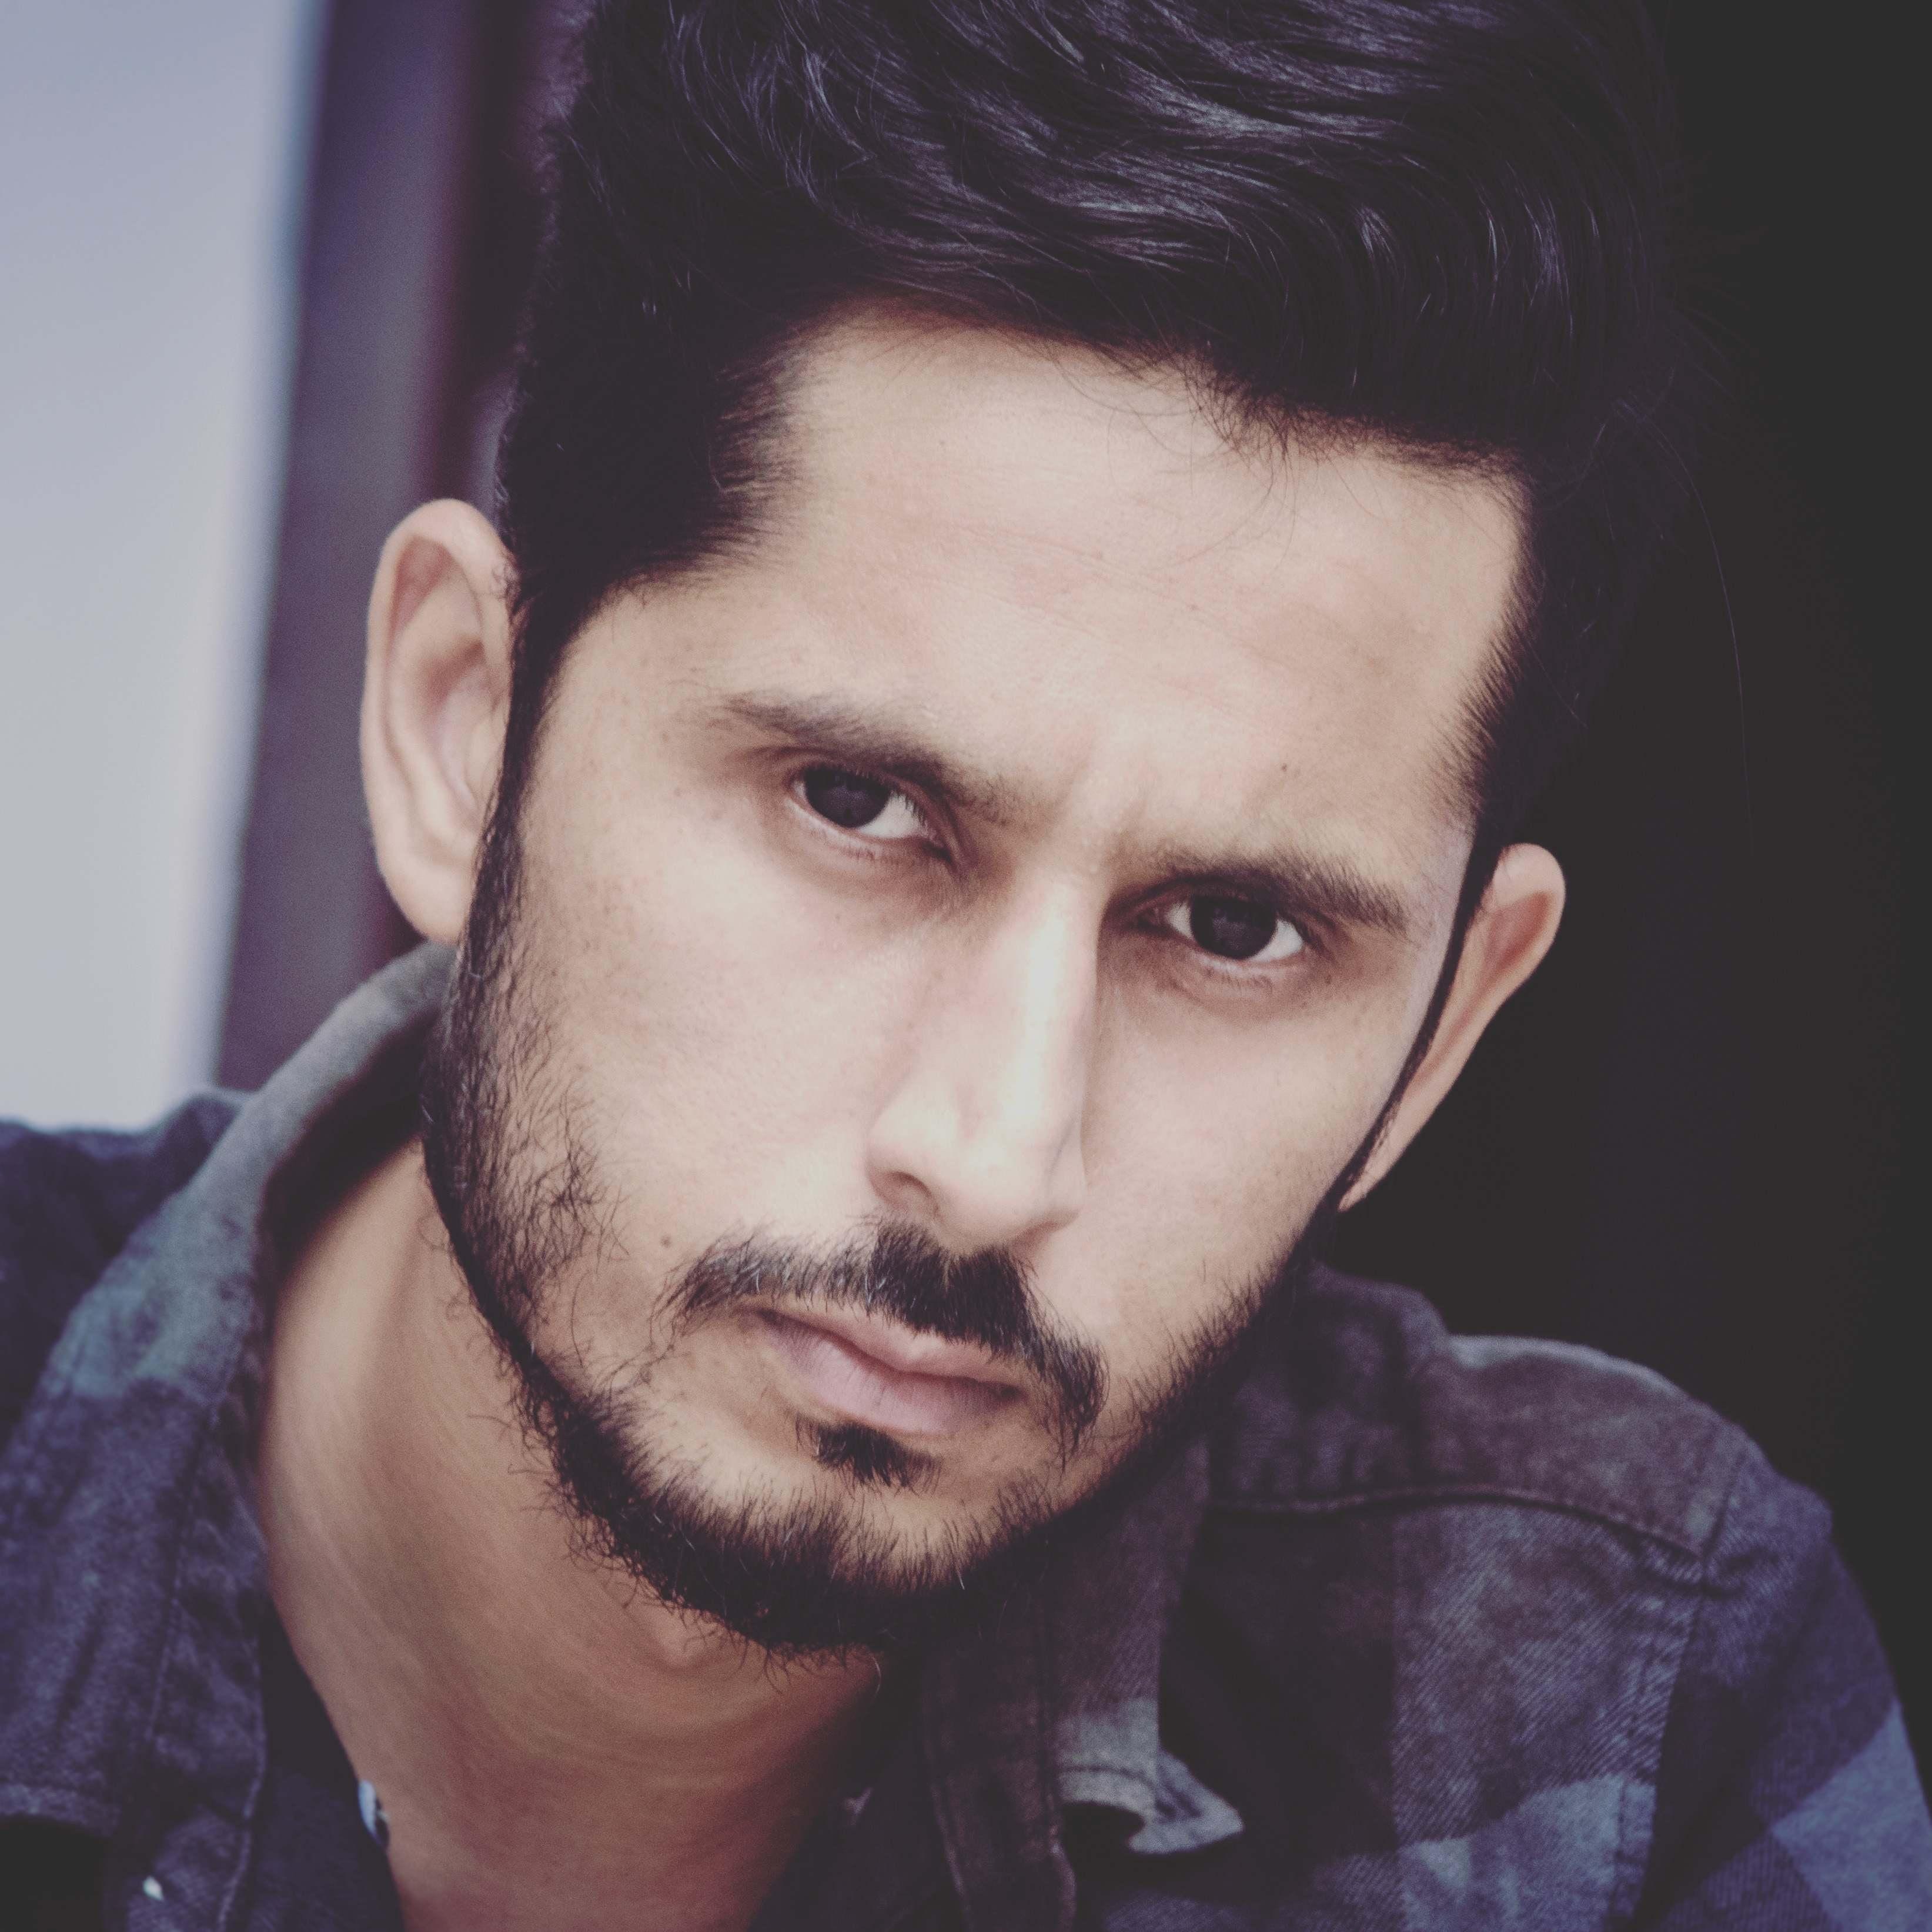 Go to Shah Ahmad's profile